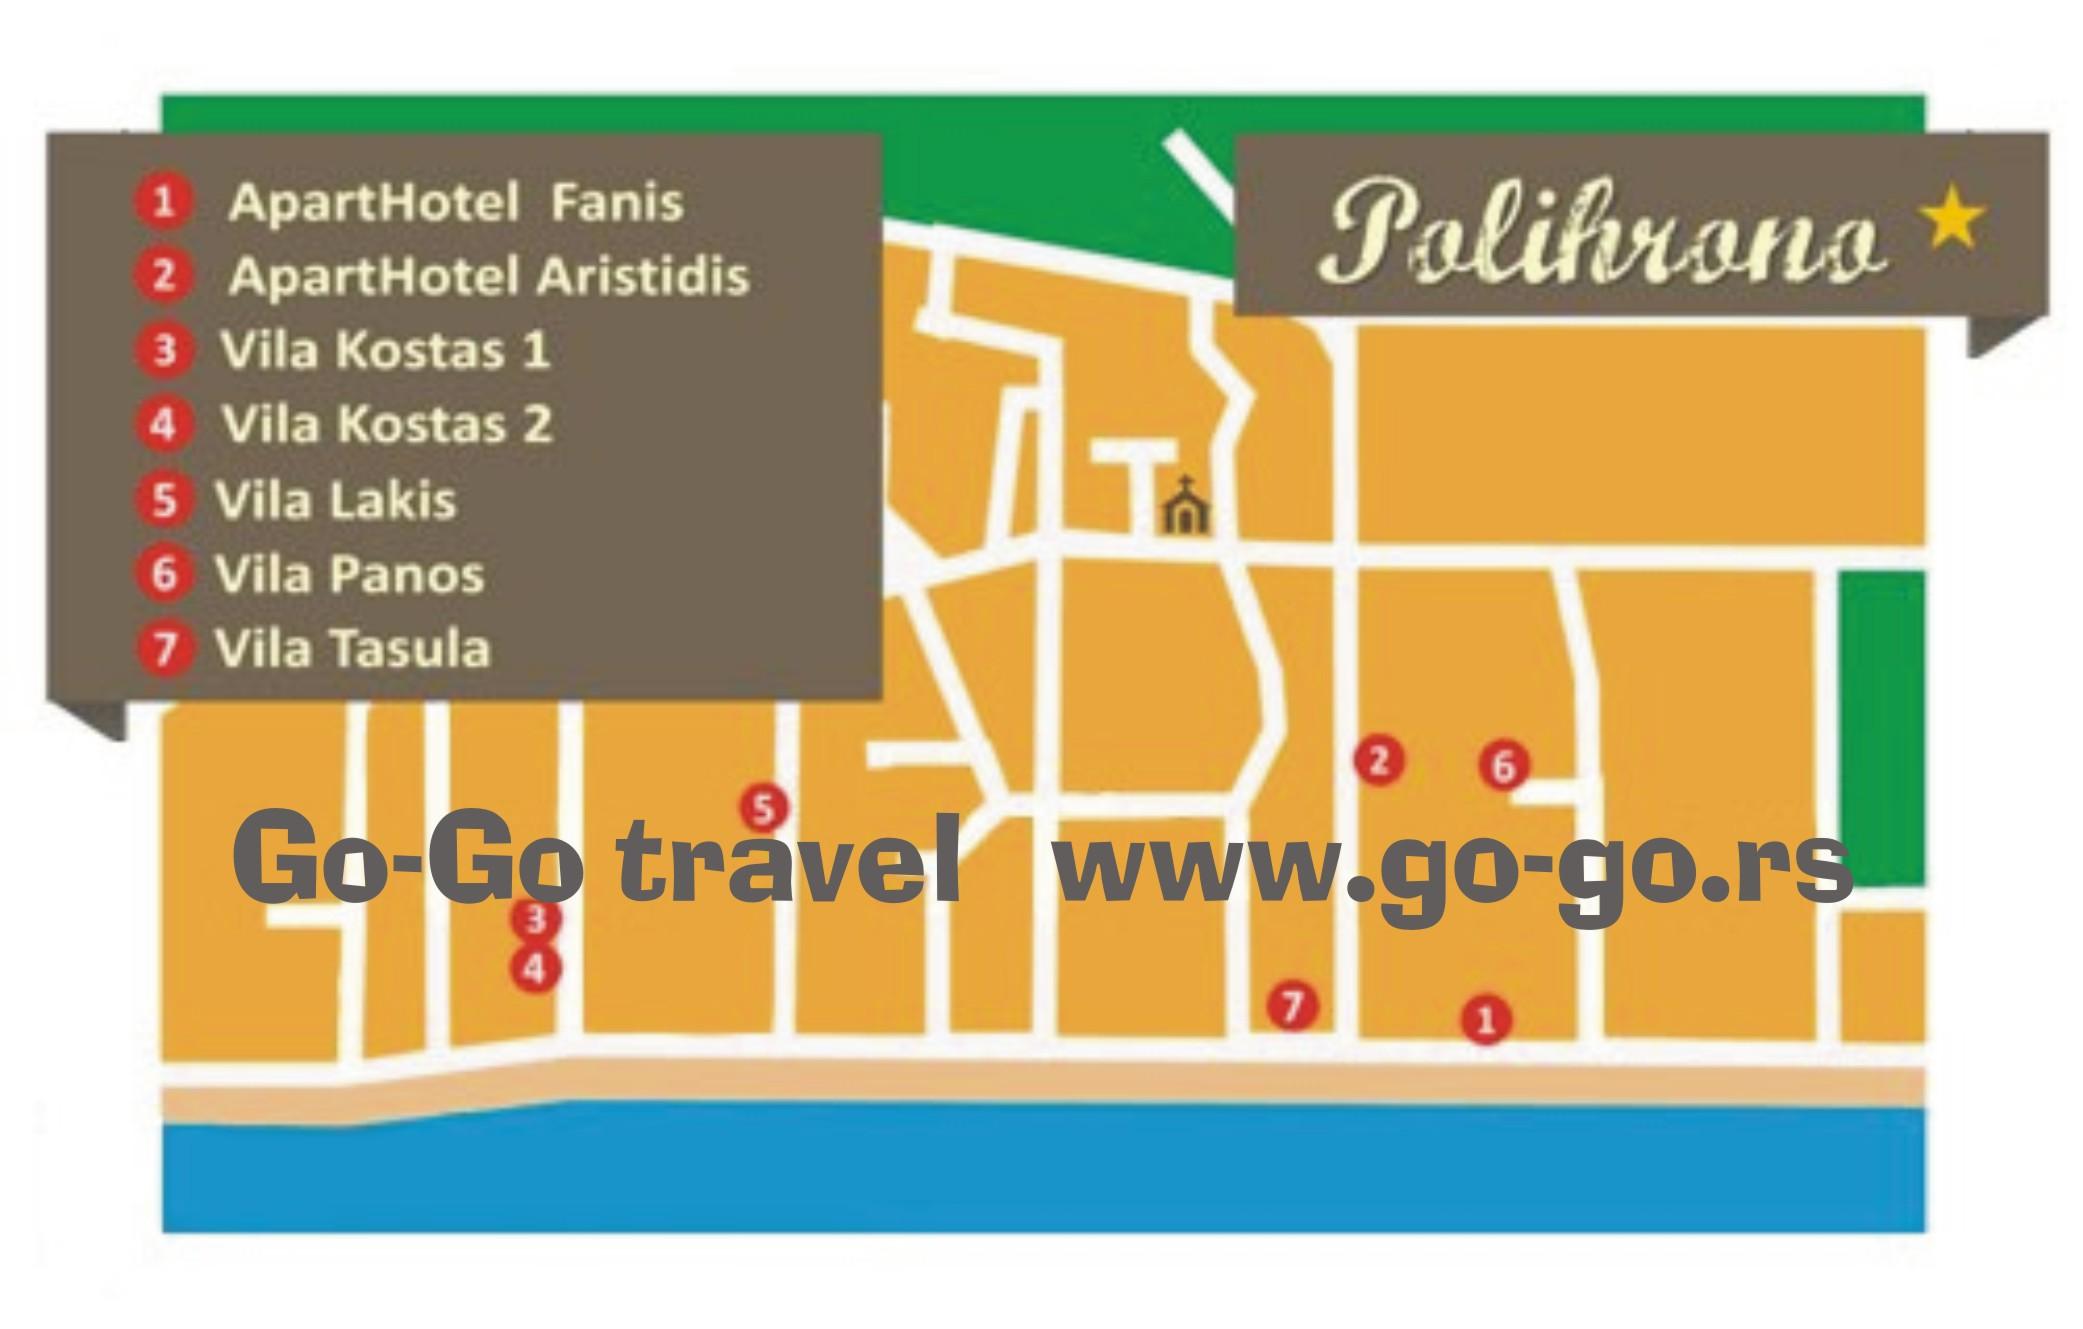 mapa polihrona grcka Index of /wp content/gallery/polihrono vila lakis mapa polihrona grcka